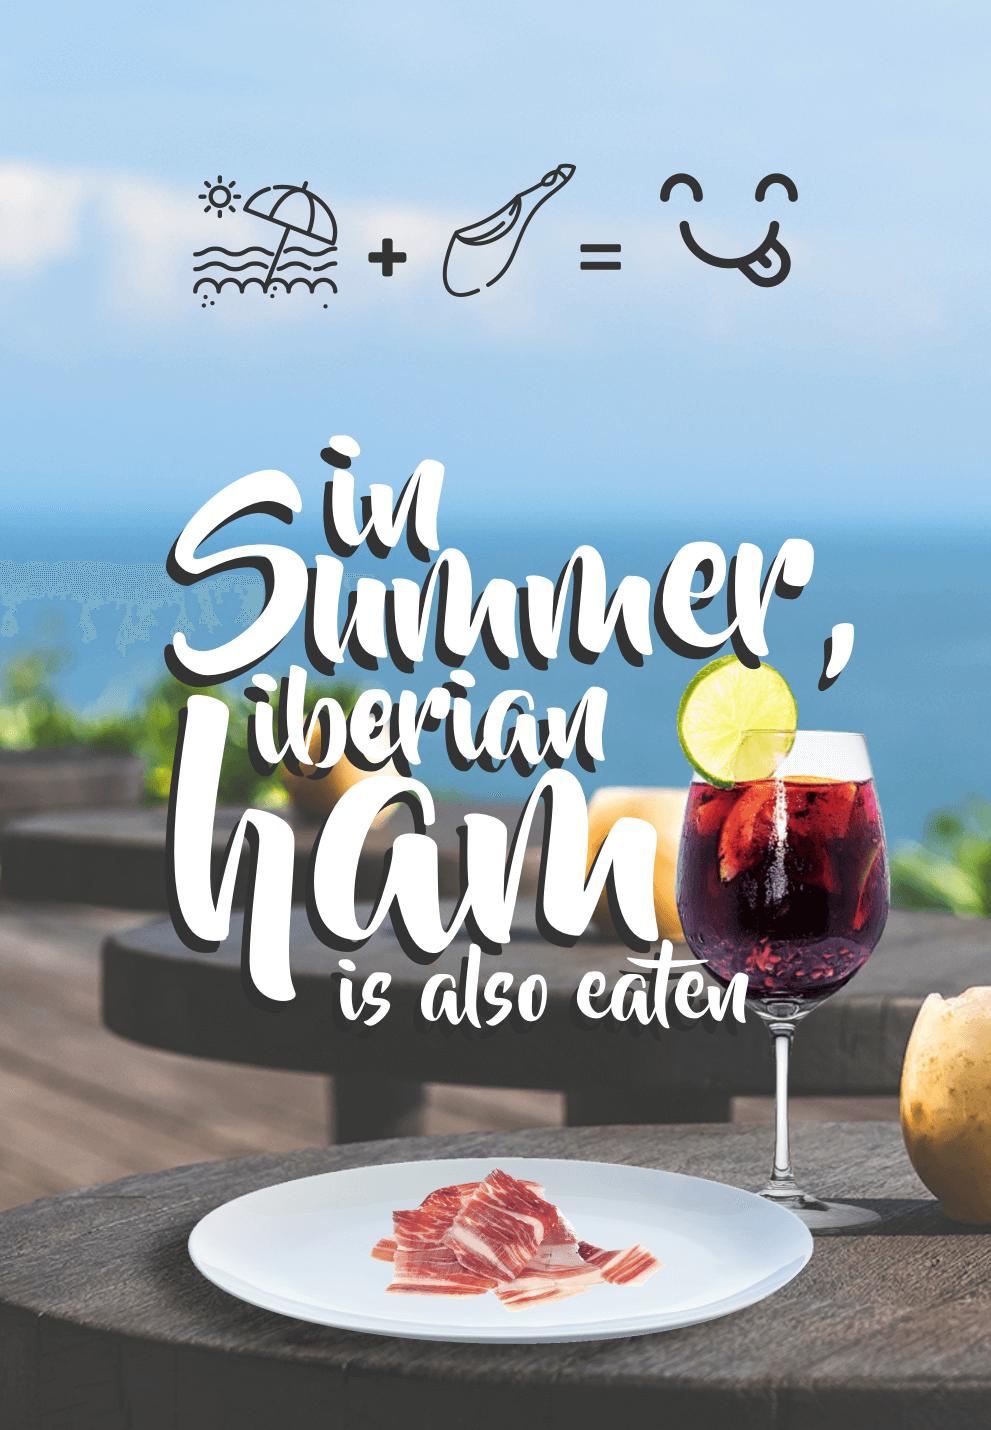 In summer, cured ham is also eaten